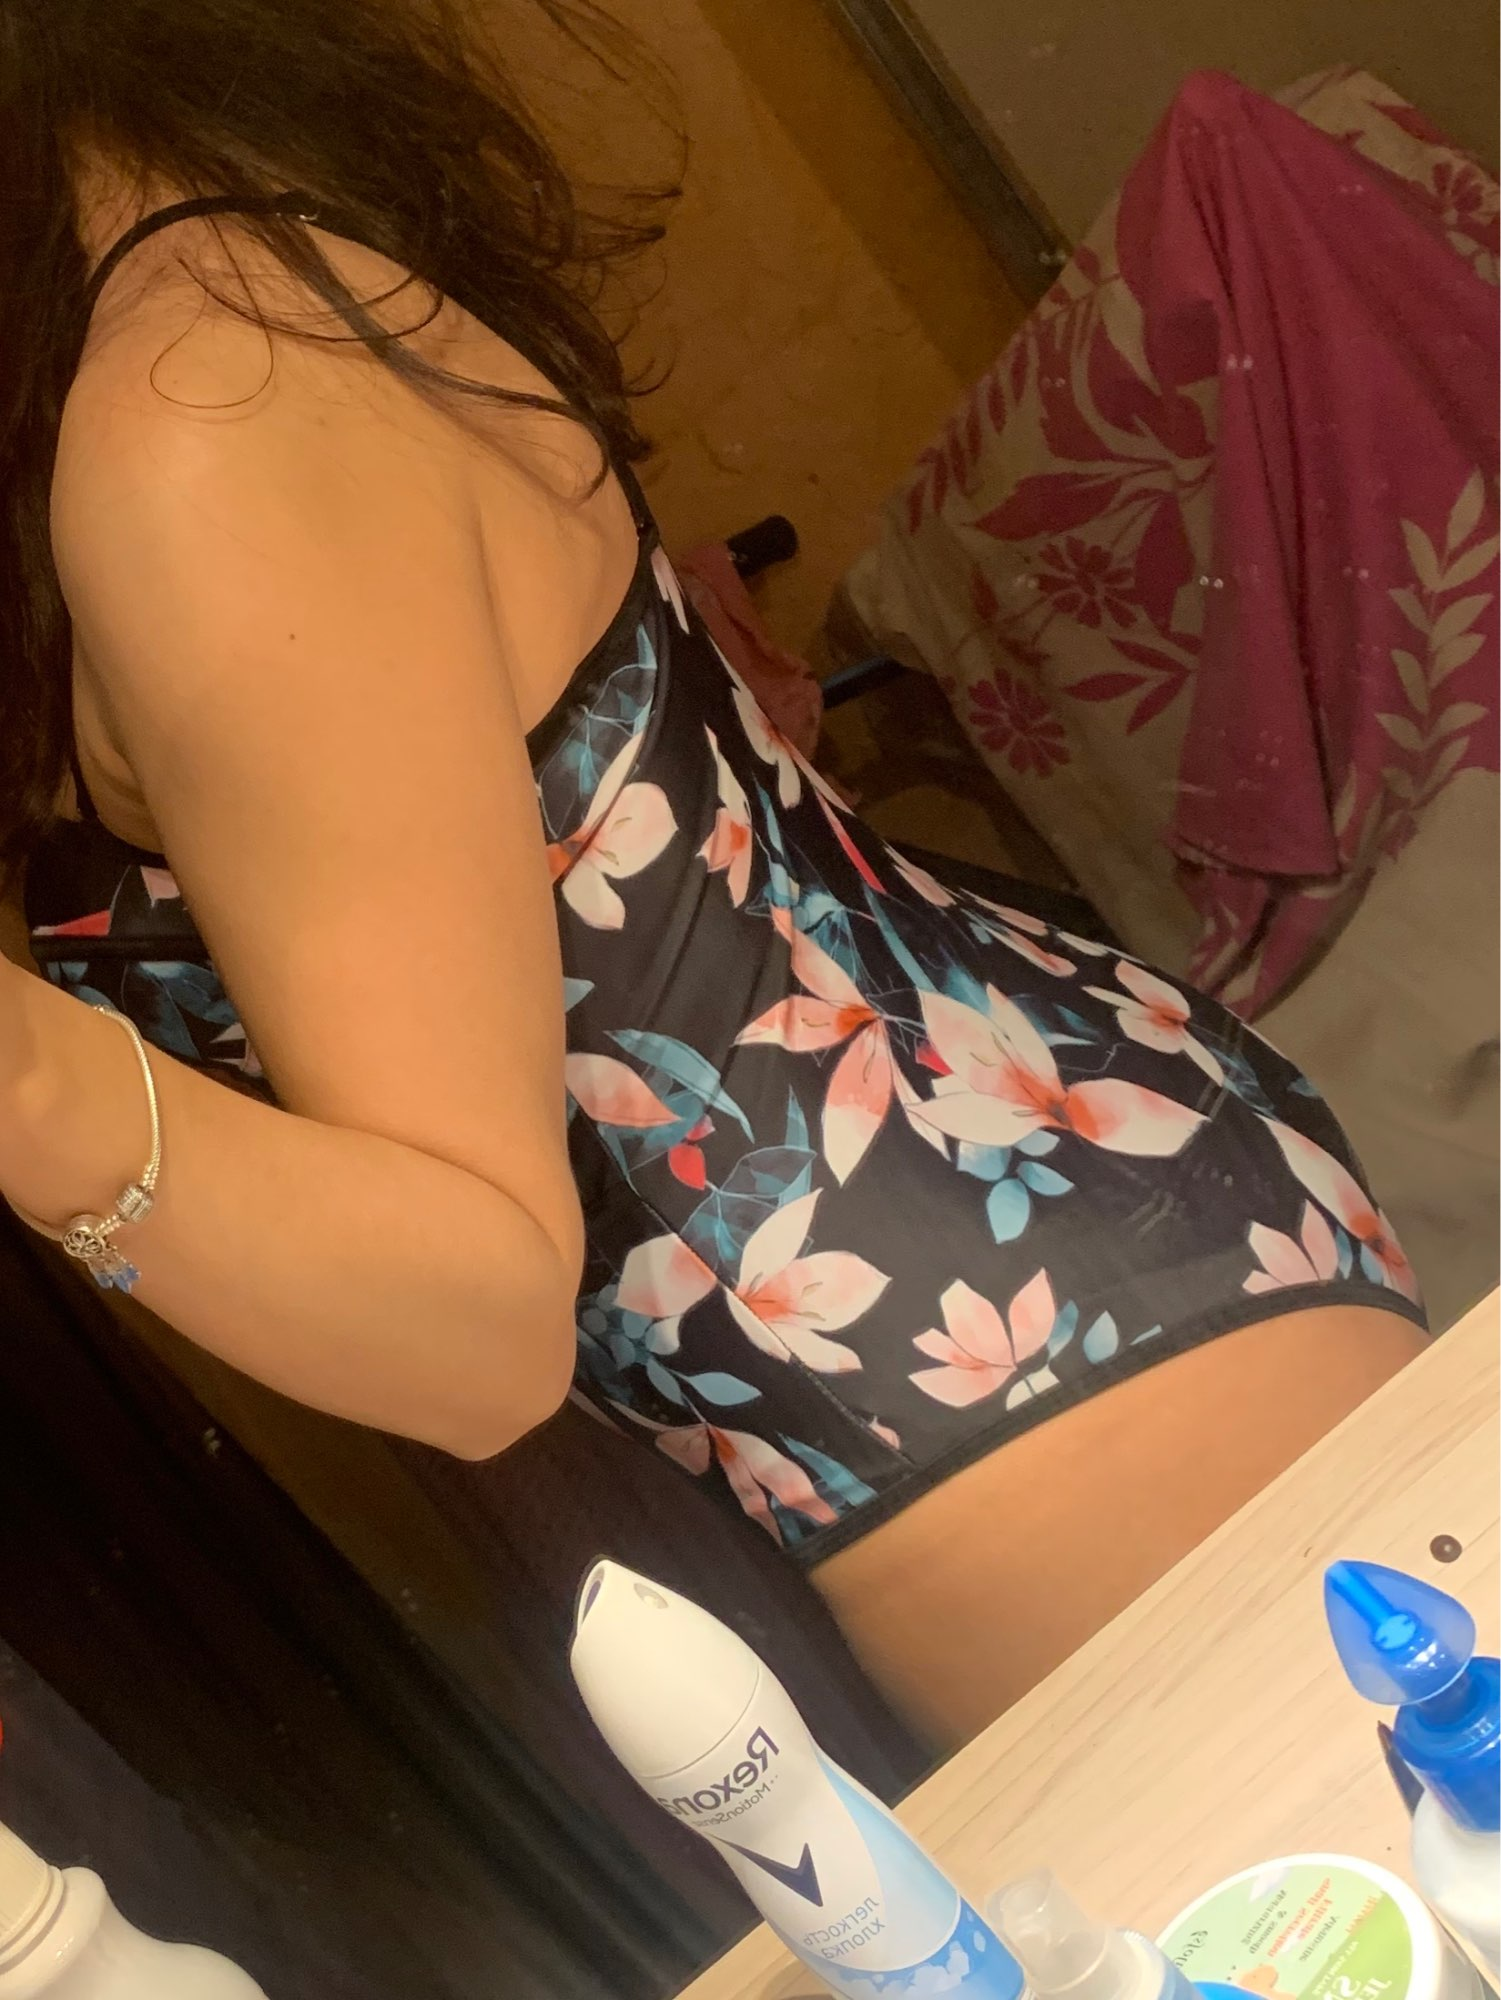 2021 New Sexy One Piece Swimsuit Women Swimwear Cut Out Bathing Suit Summer Push Up Monokini Print Swim Suit  Beach Wear Female| |   - AliExpress